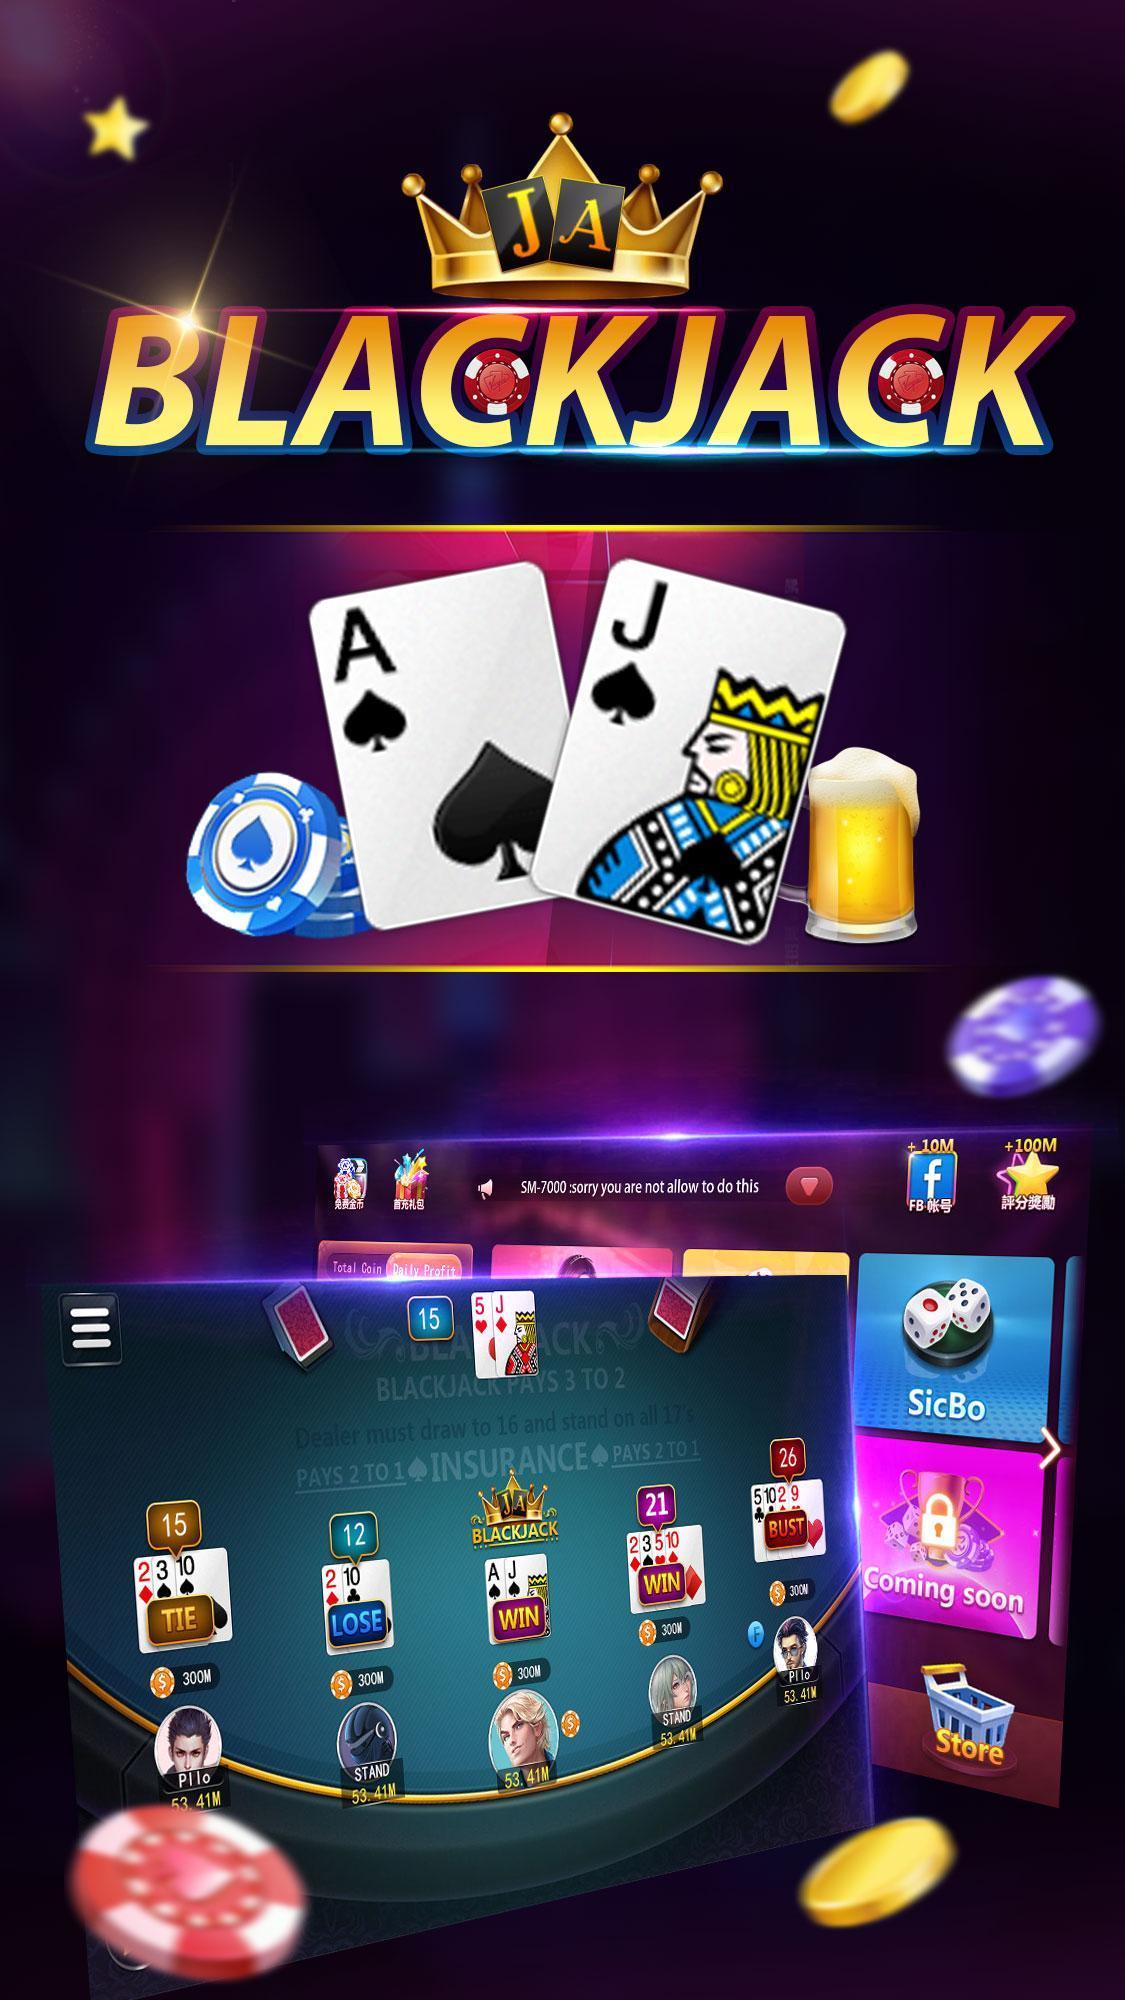 Blackjack 21 Online Free Coins For Android Apk Download